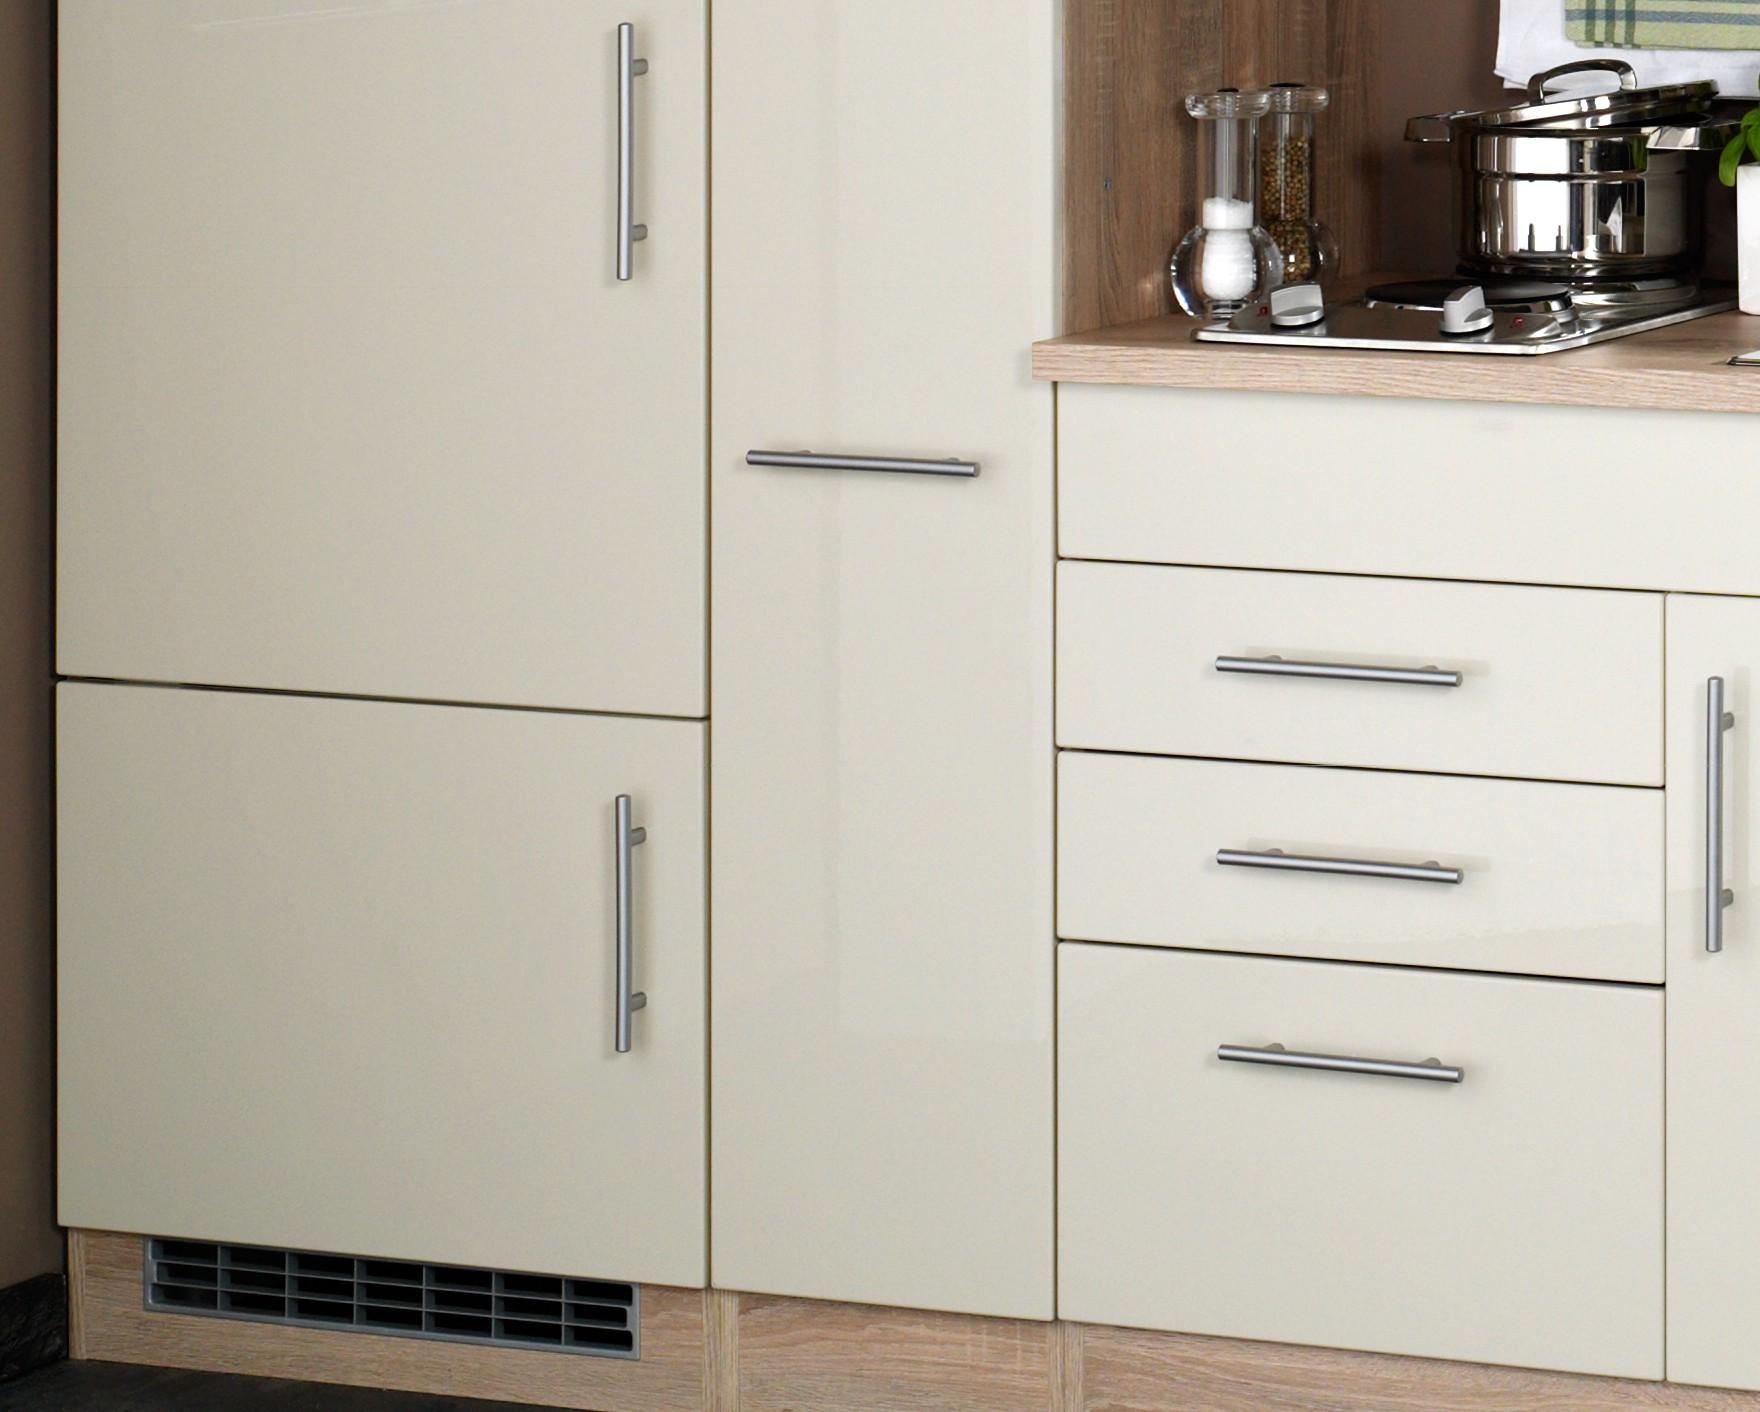 singlek che berlin breite 190 cm hochglanz creme eiche sonoma k che singlek chen. Black Bedroom Furniture Sets. Home Design Ideas